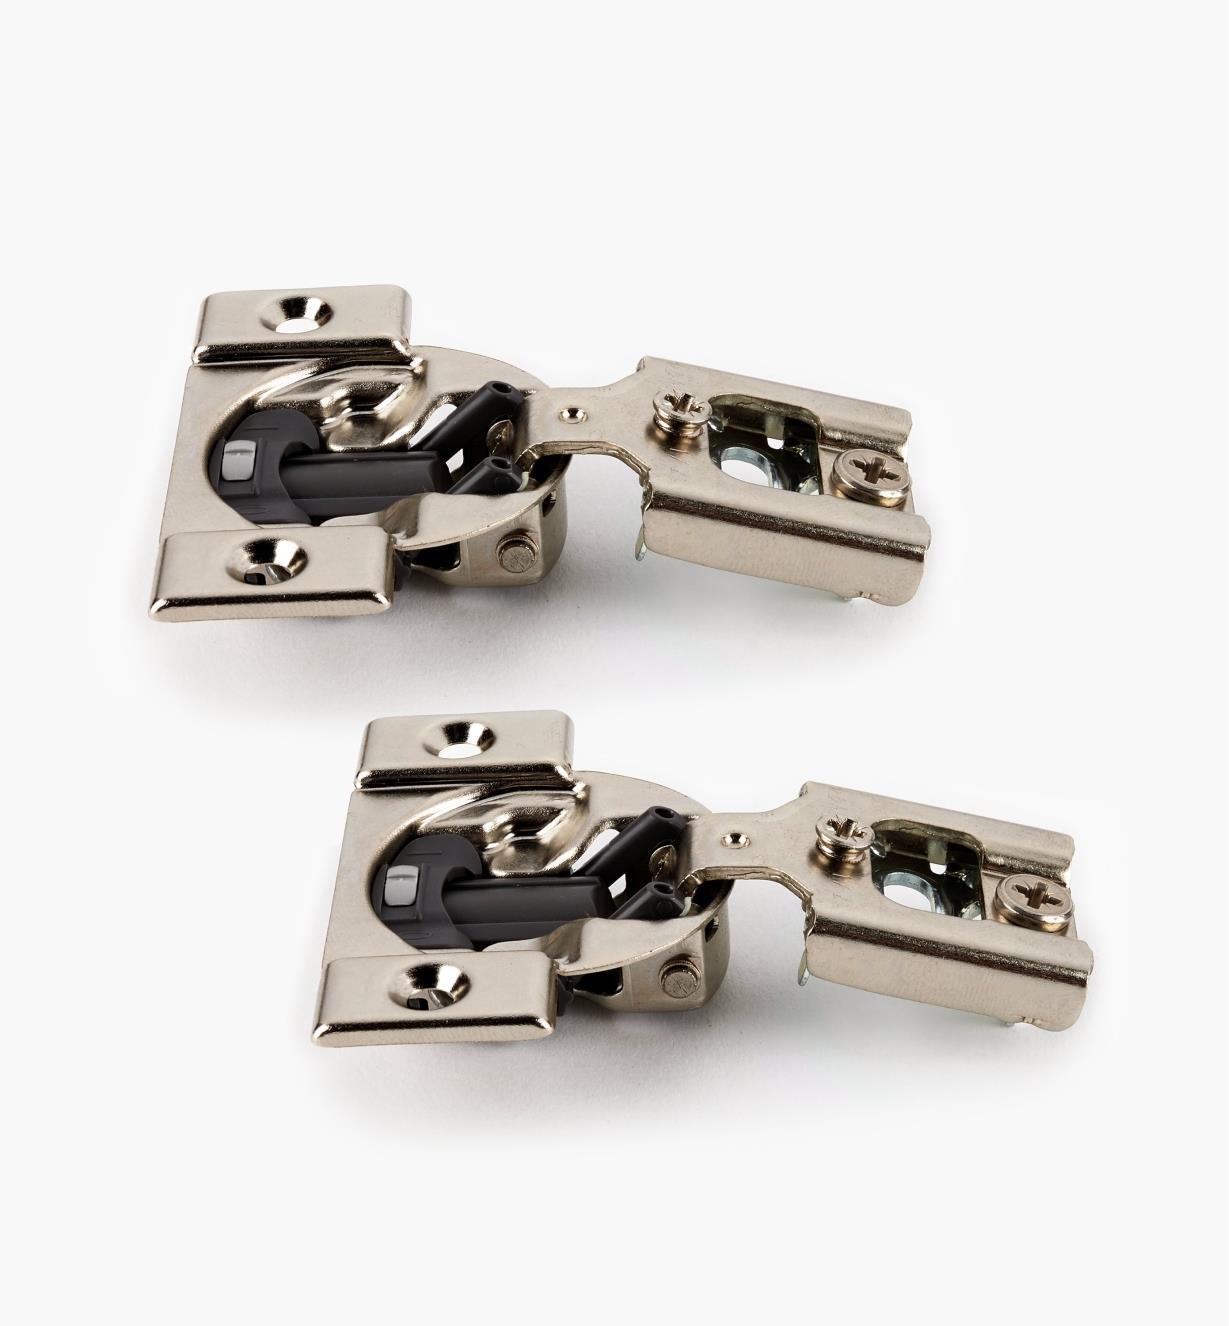 00B1814 - Compact Blumotion 105° Half-Overlay Hinge, pair